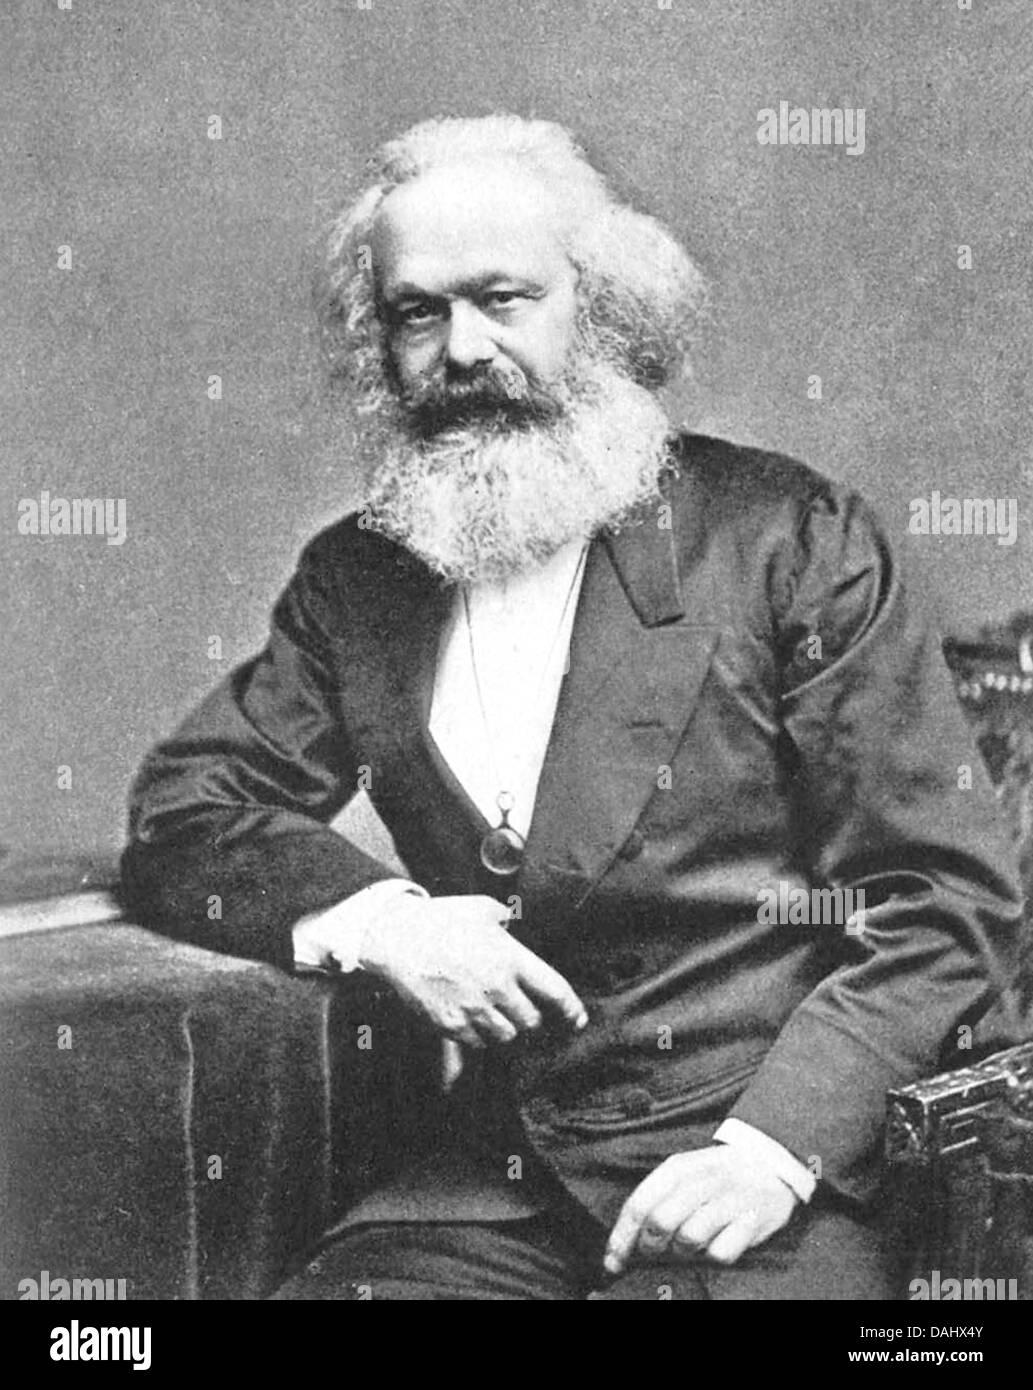 Karl Marx, Karl Heinrich Marx - Stock Image